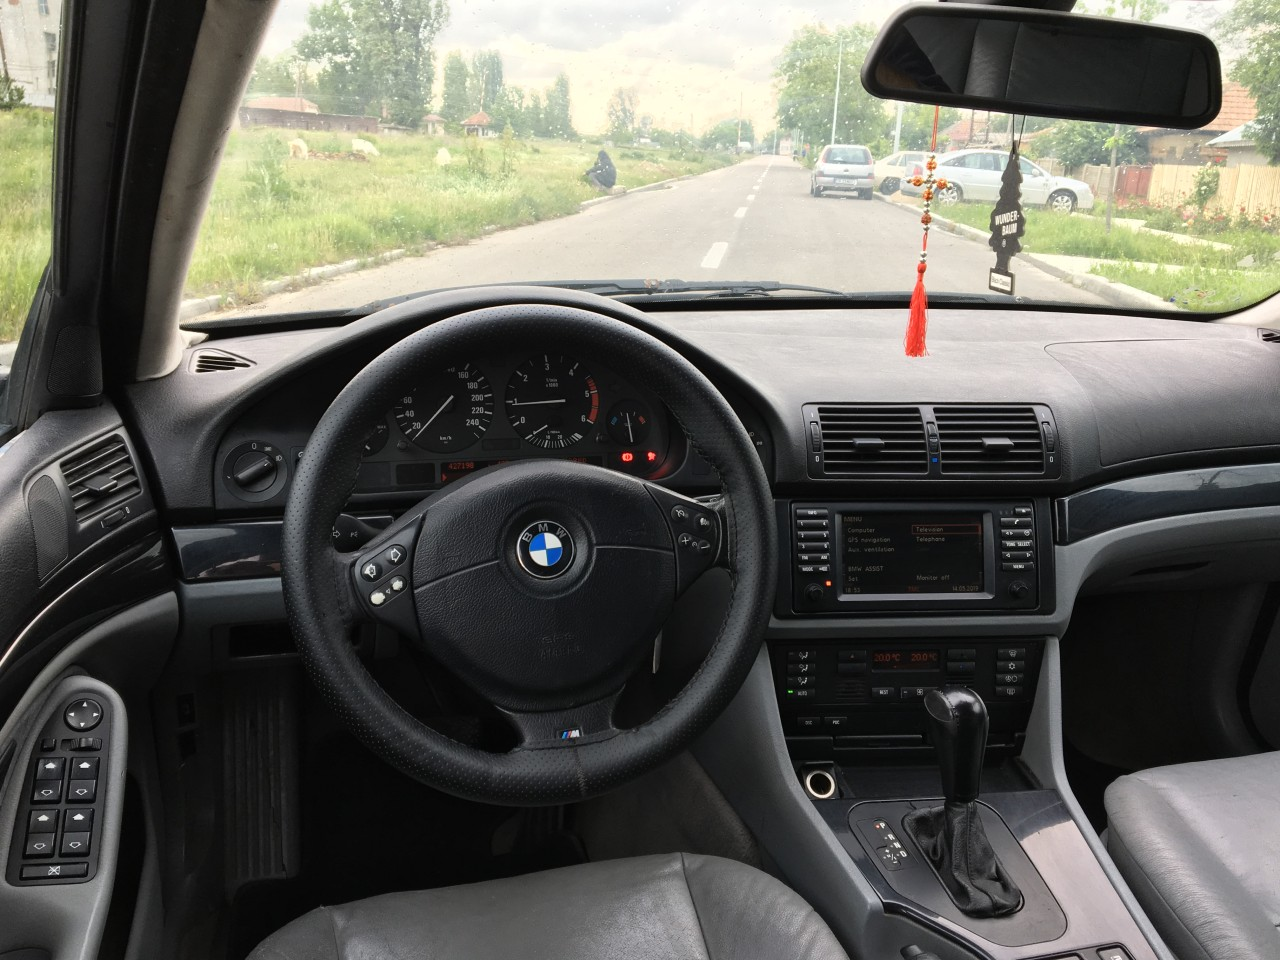 BMW 525 2.5 diesel 2002